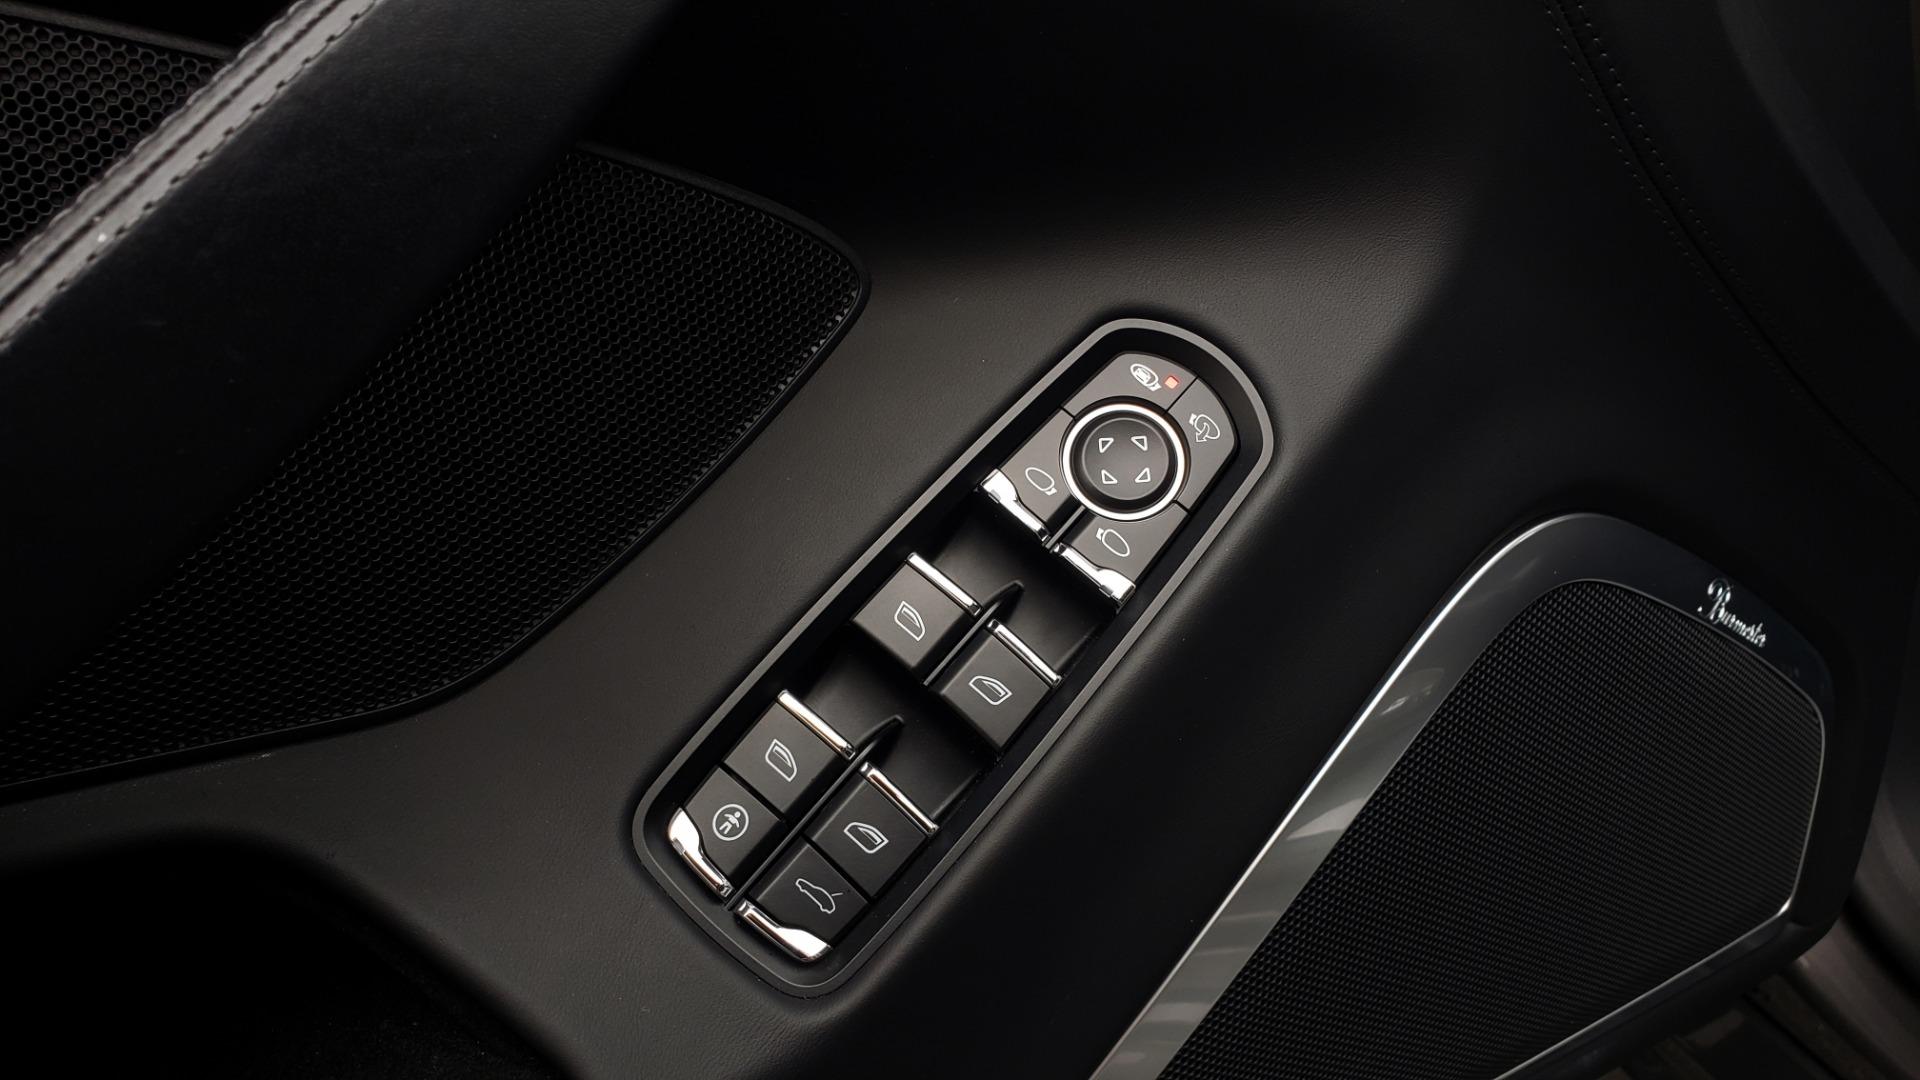 Used 2013 Porsche PANAMERA TURBO 4.8L V8 / AWD / NAV / SUNROOF / LCA / PARK ASST / BURMESTER for sale $45,995 at Formula Imports in Charlotte NC 28227 31